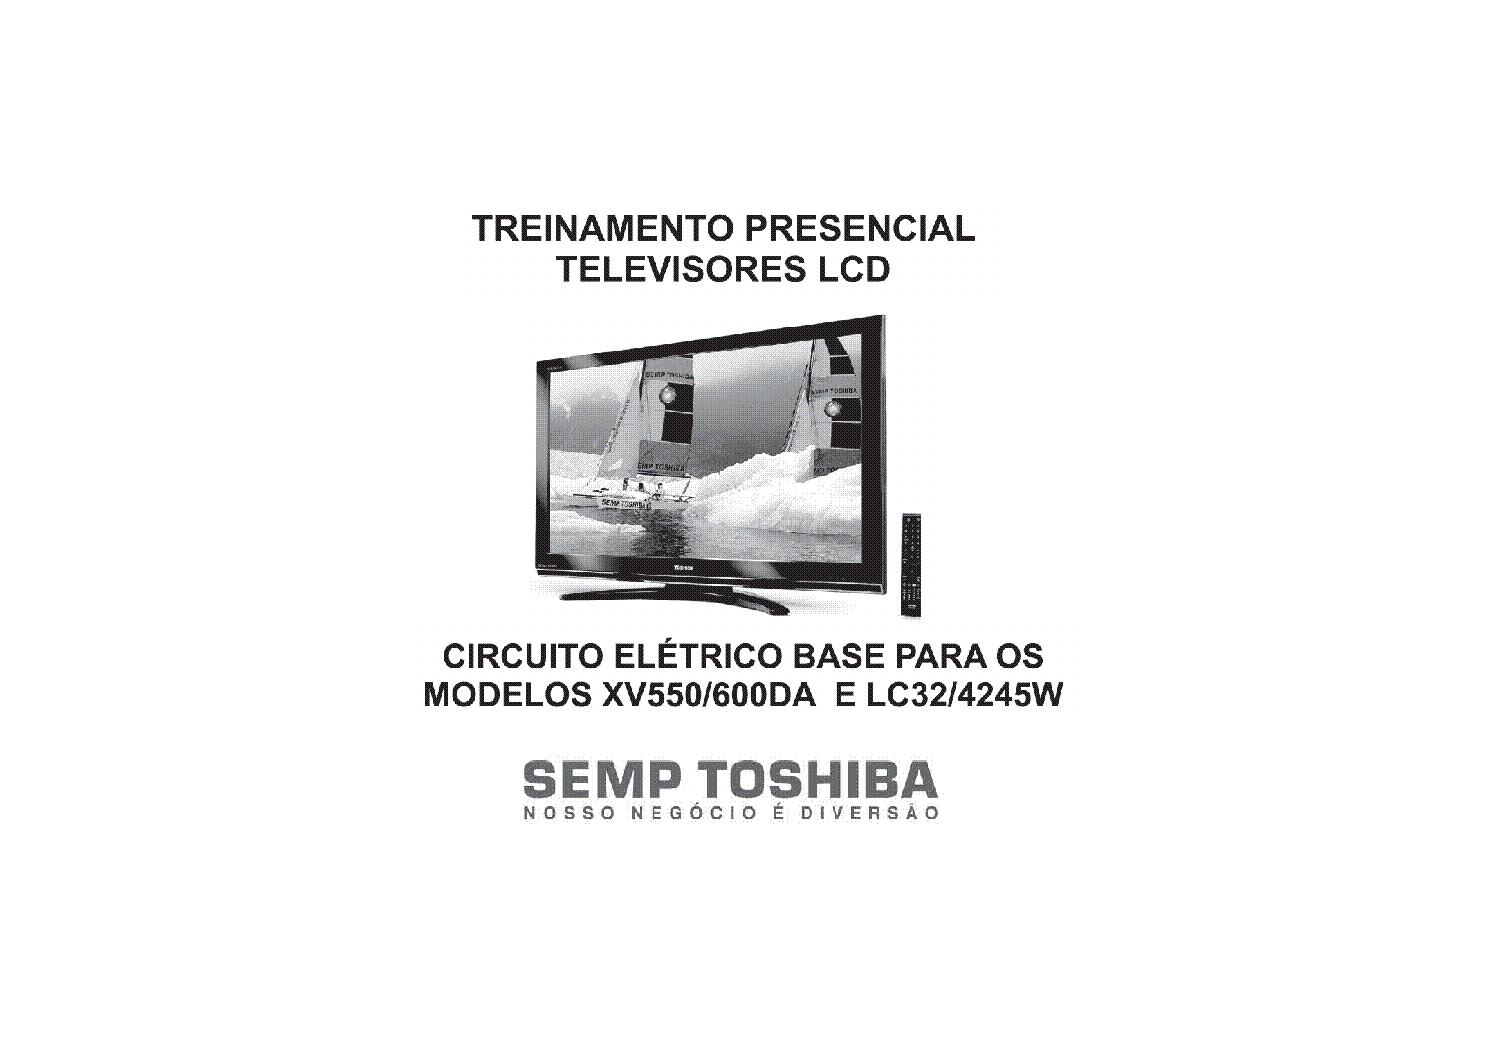 toshiba 29vh-36g схема